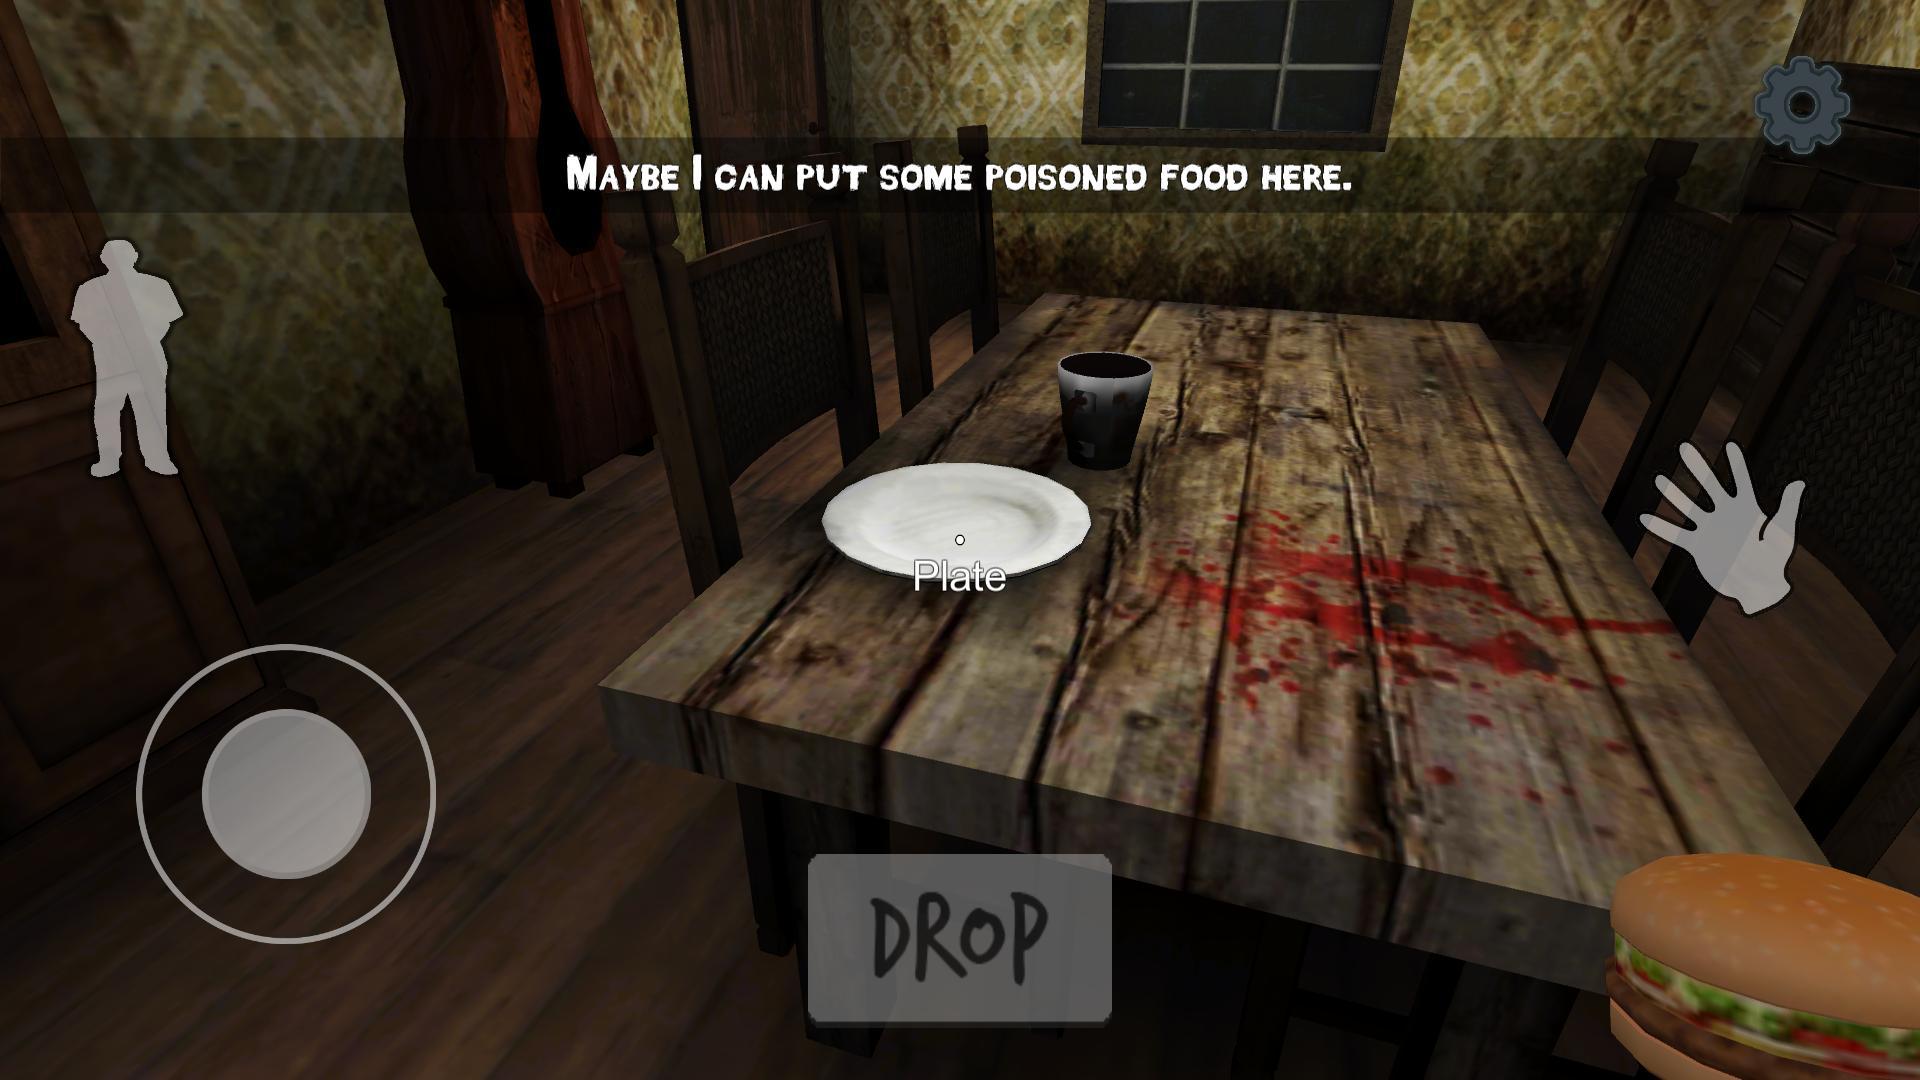 Evil Kid The Horror Game 1.1.9.5.4.4 Screenshot 7